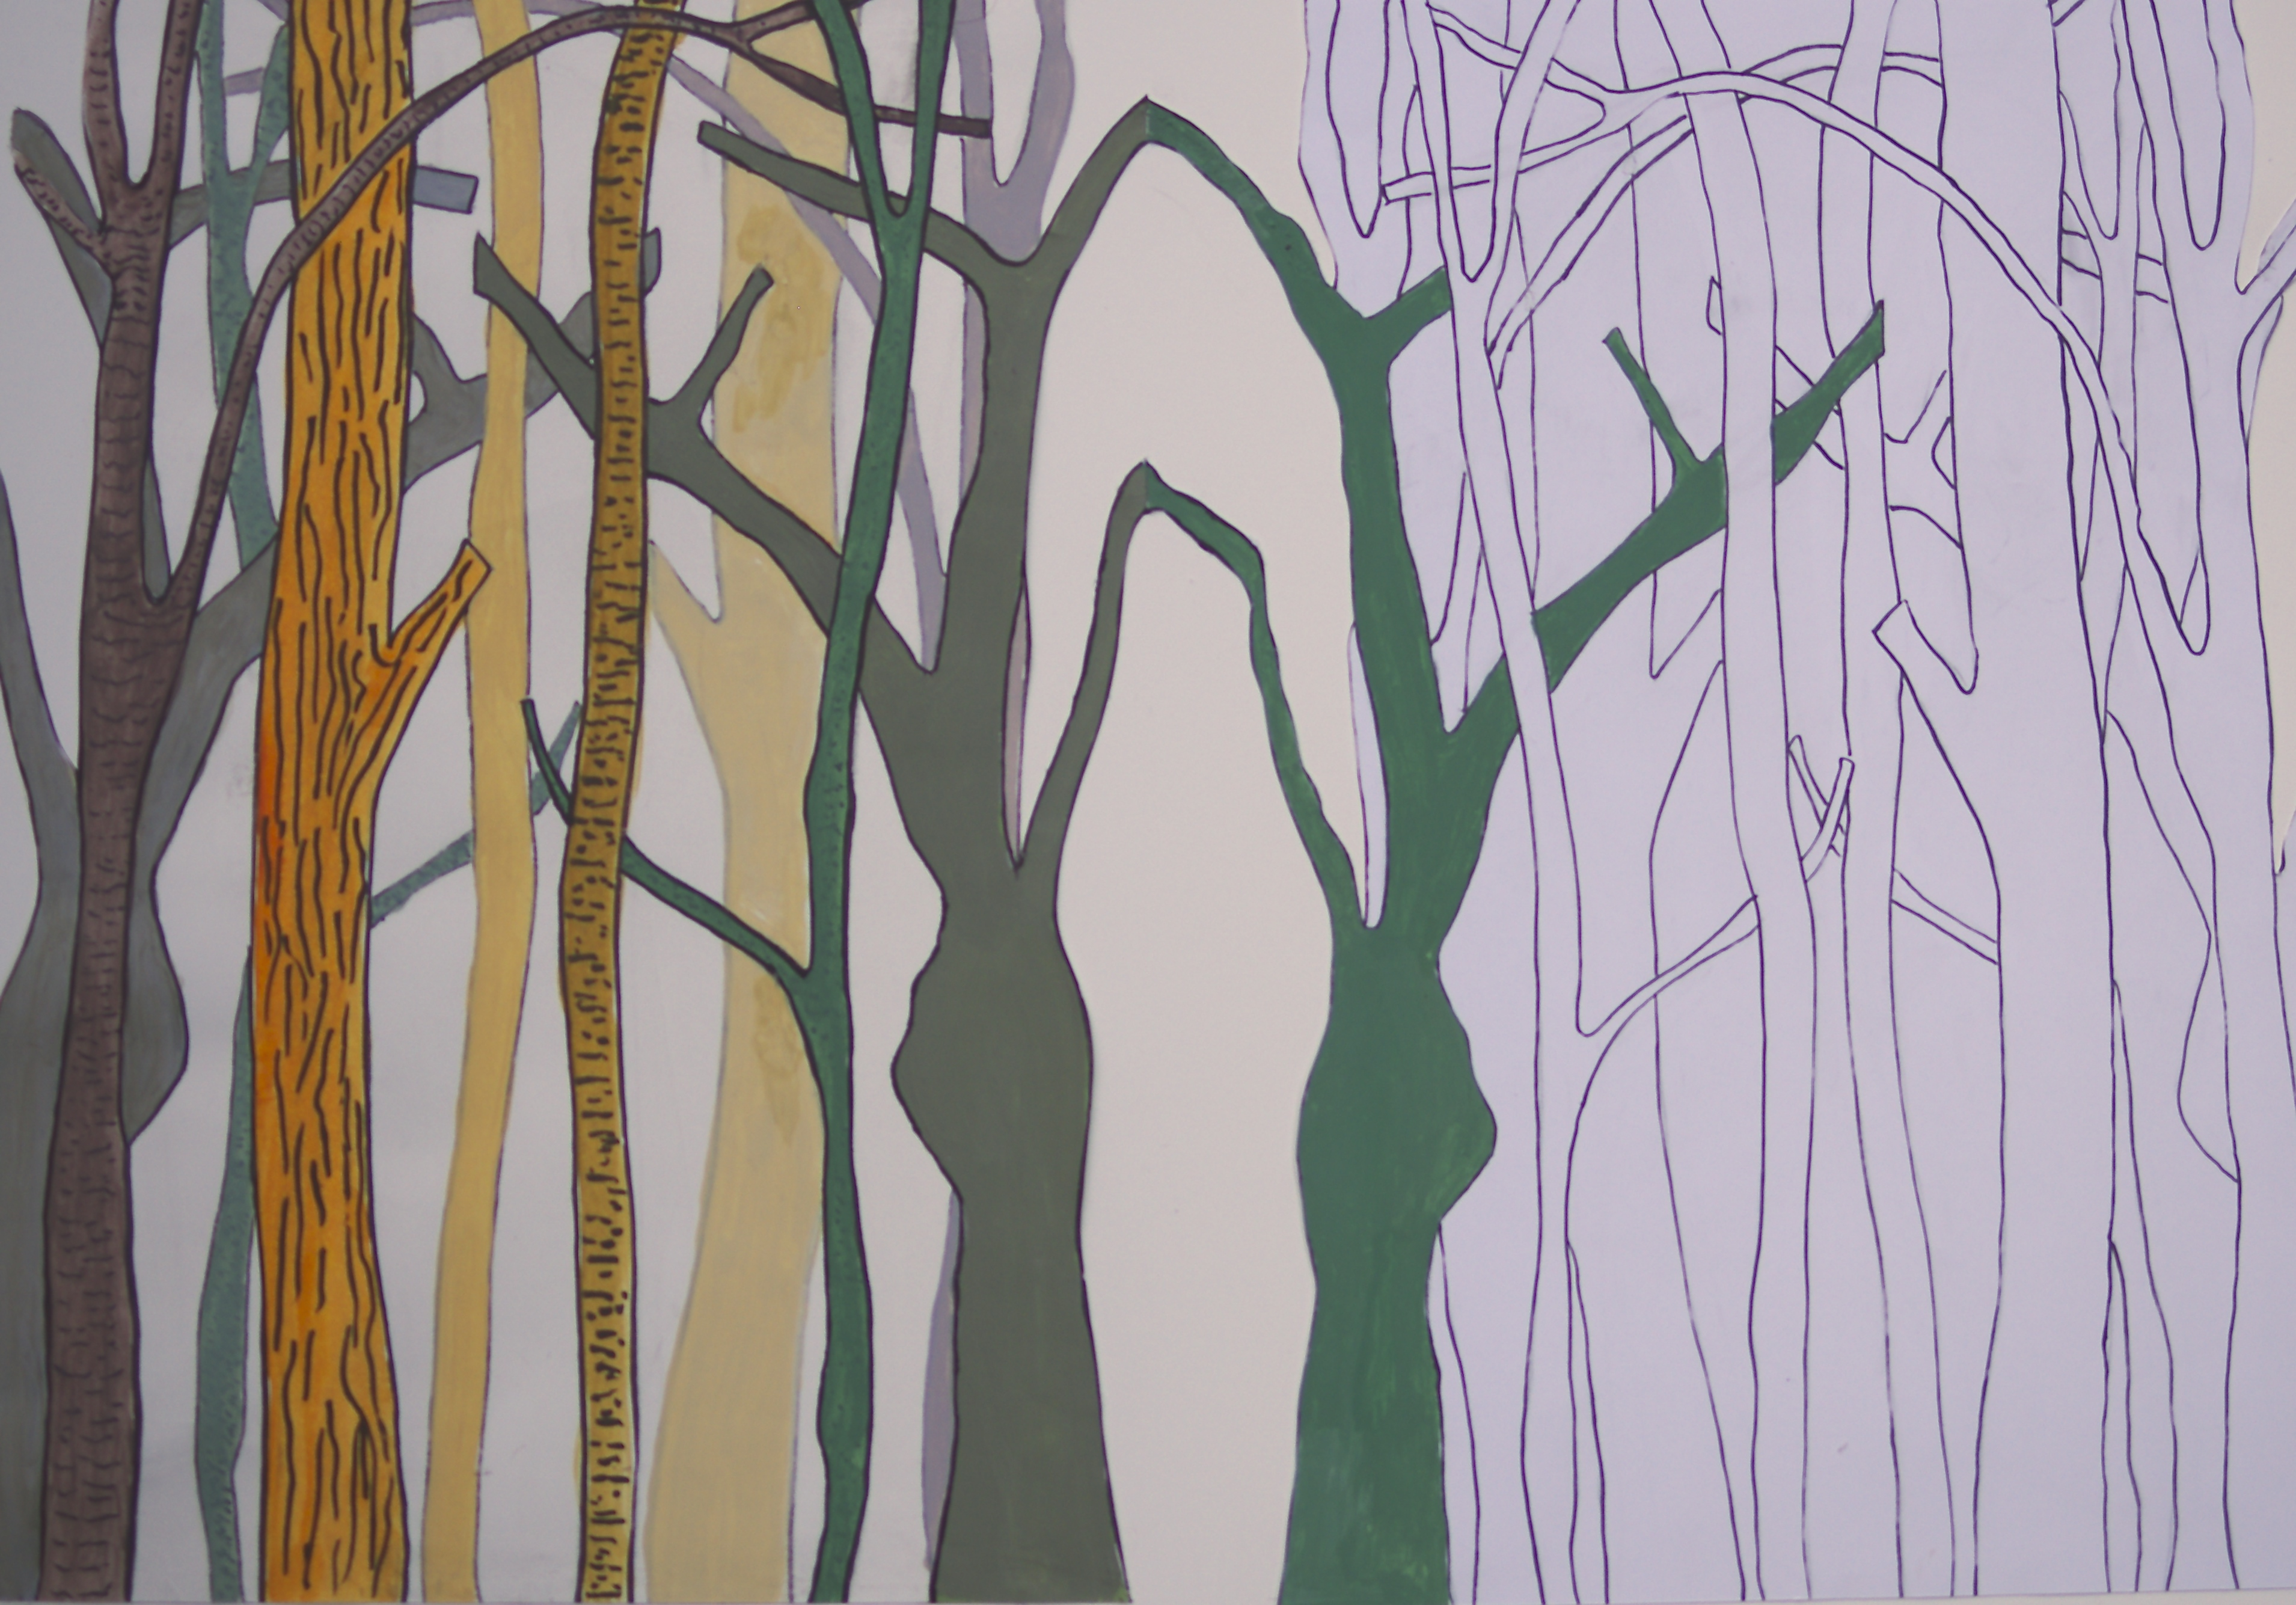 Chris RobertsBox Hill Trees